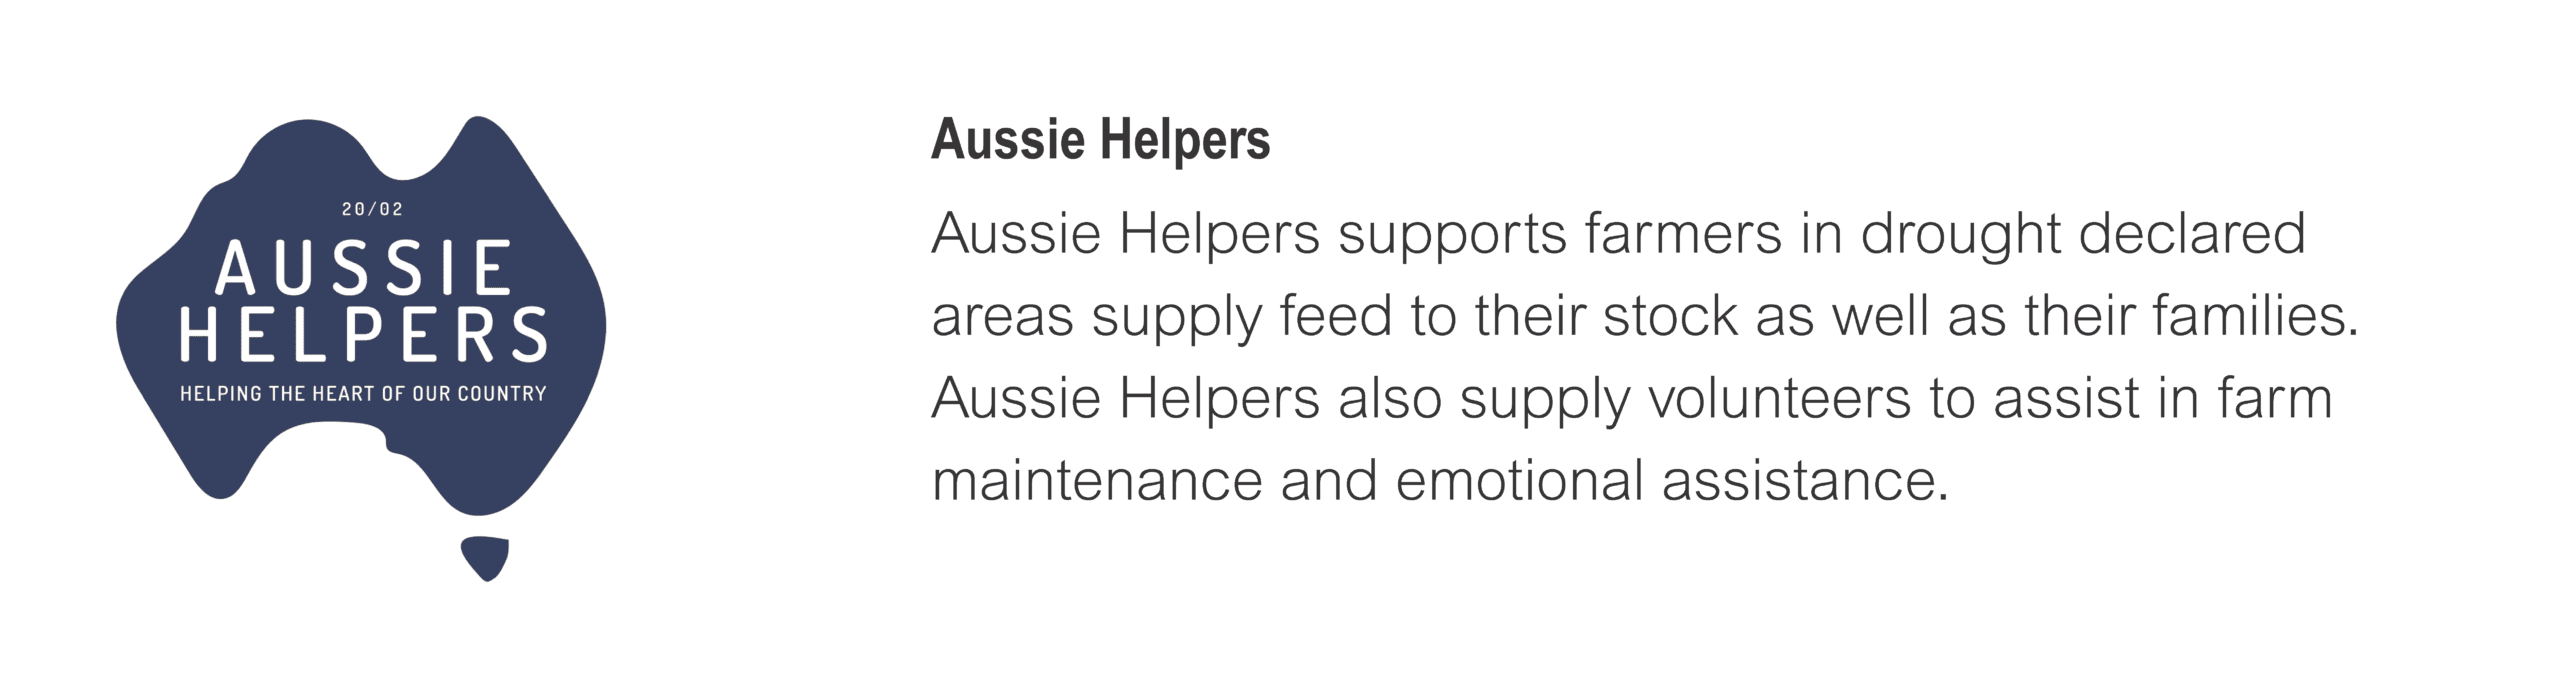 Charity_Aussie Helpers_colour